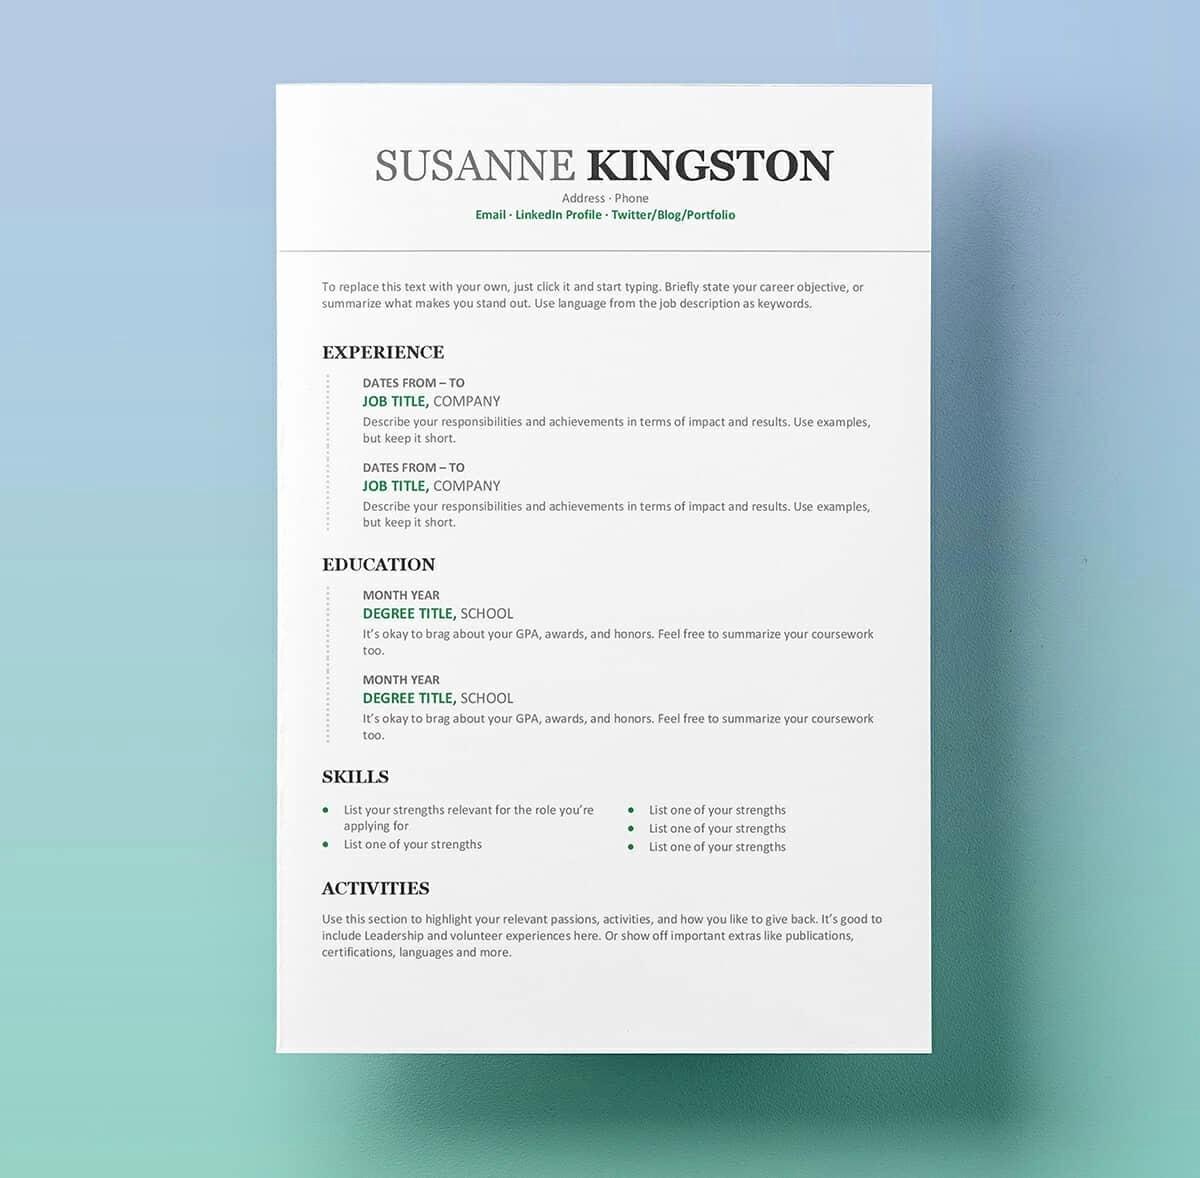 Professional Resume Templates Microsoft Word Fresh Resume Templates for Word Free 15 Examples for Download